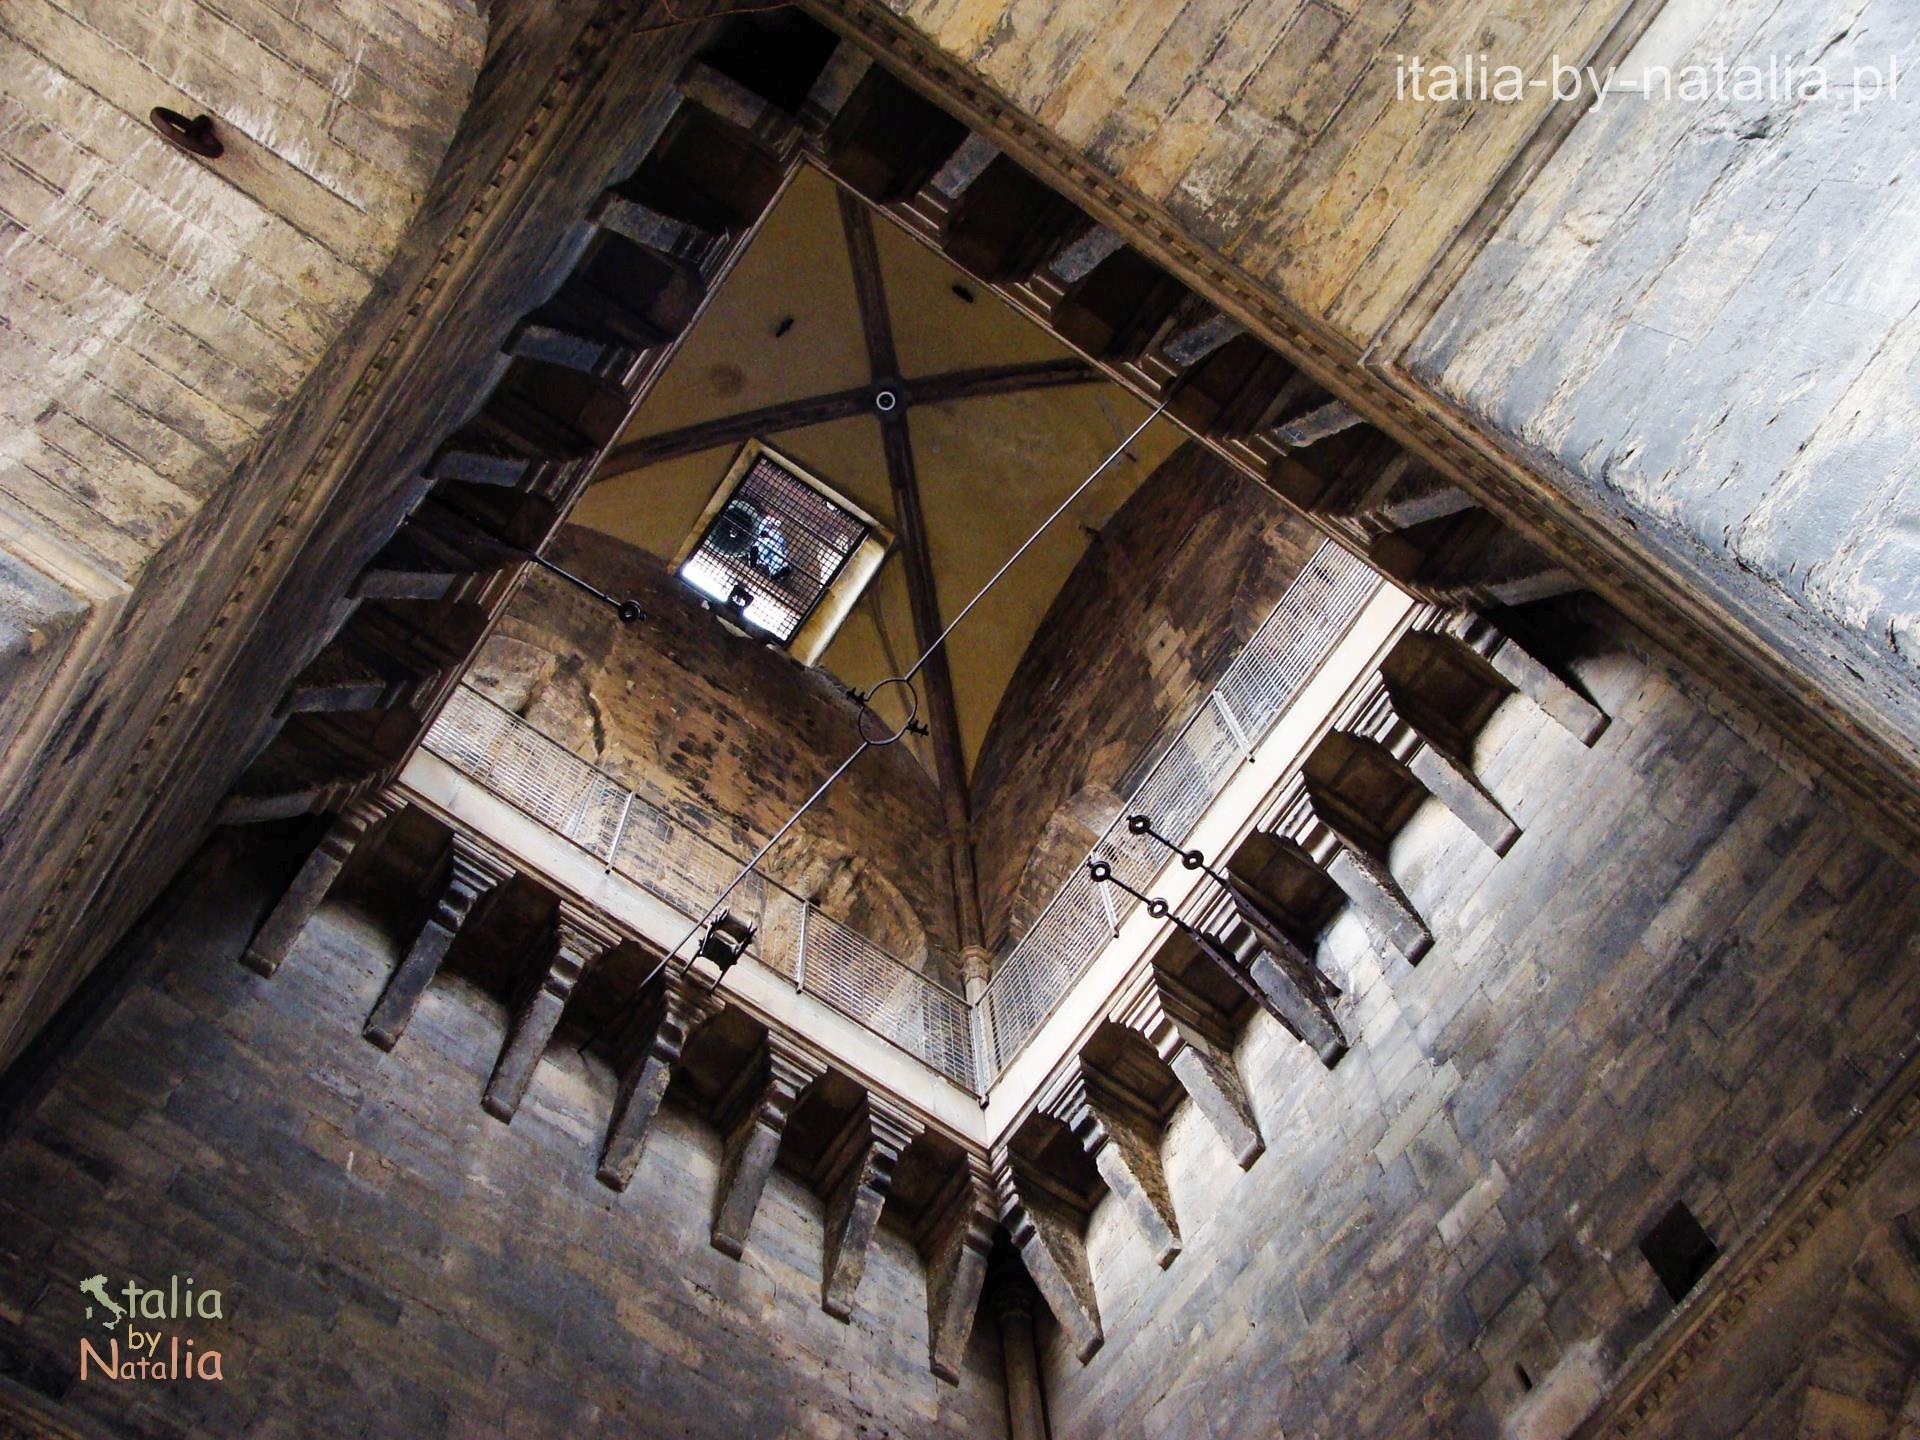 Florencja Campanile di Giotto dzwonnica Duomo